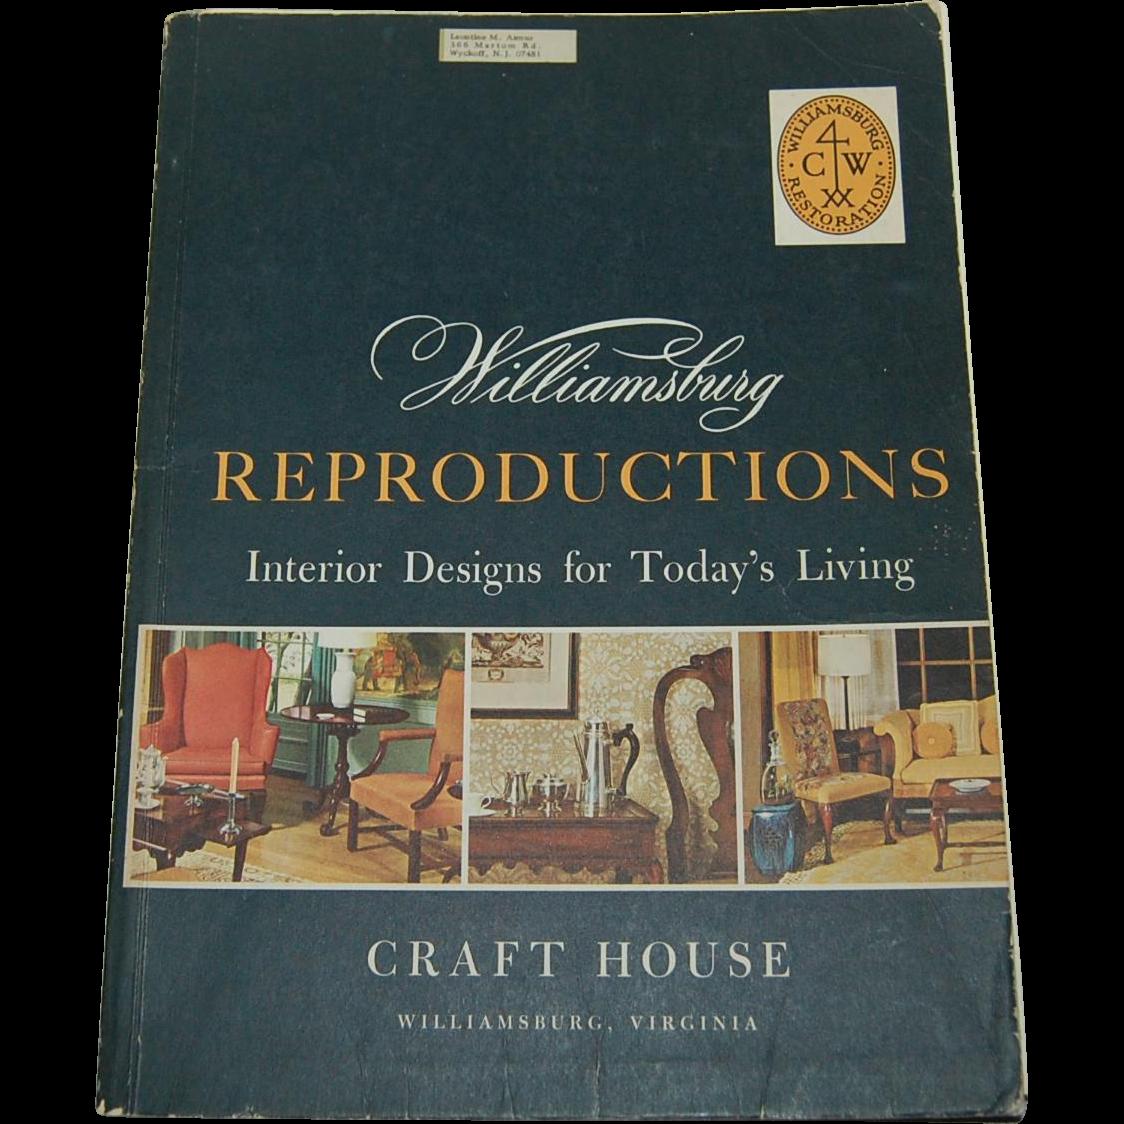 Wiliamsburg reproductions vintage catalog 1968 furniture for Williamsburg craft house catalog